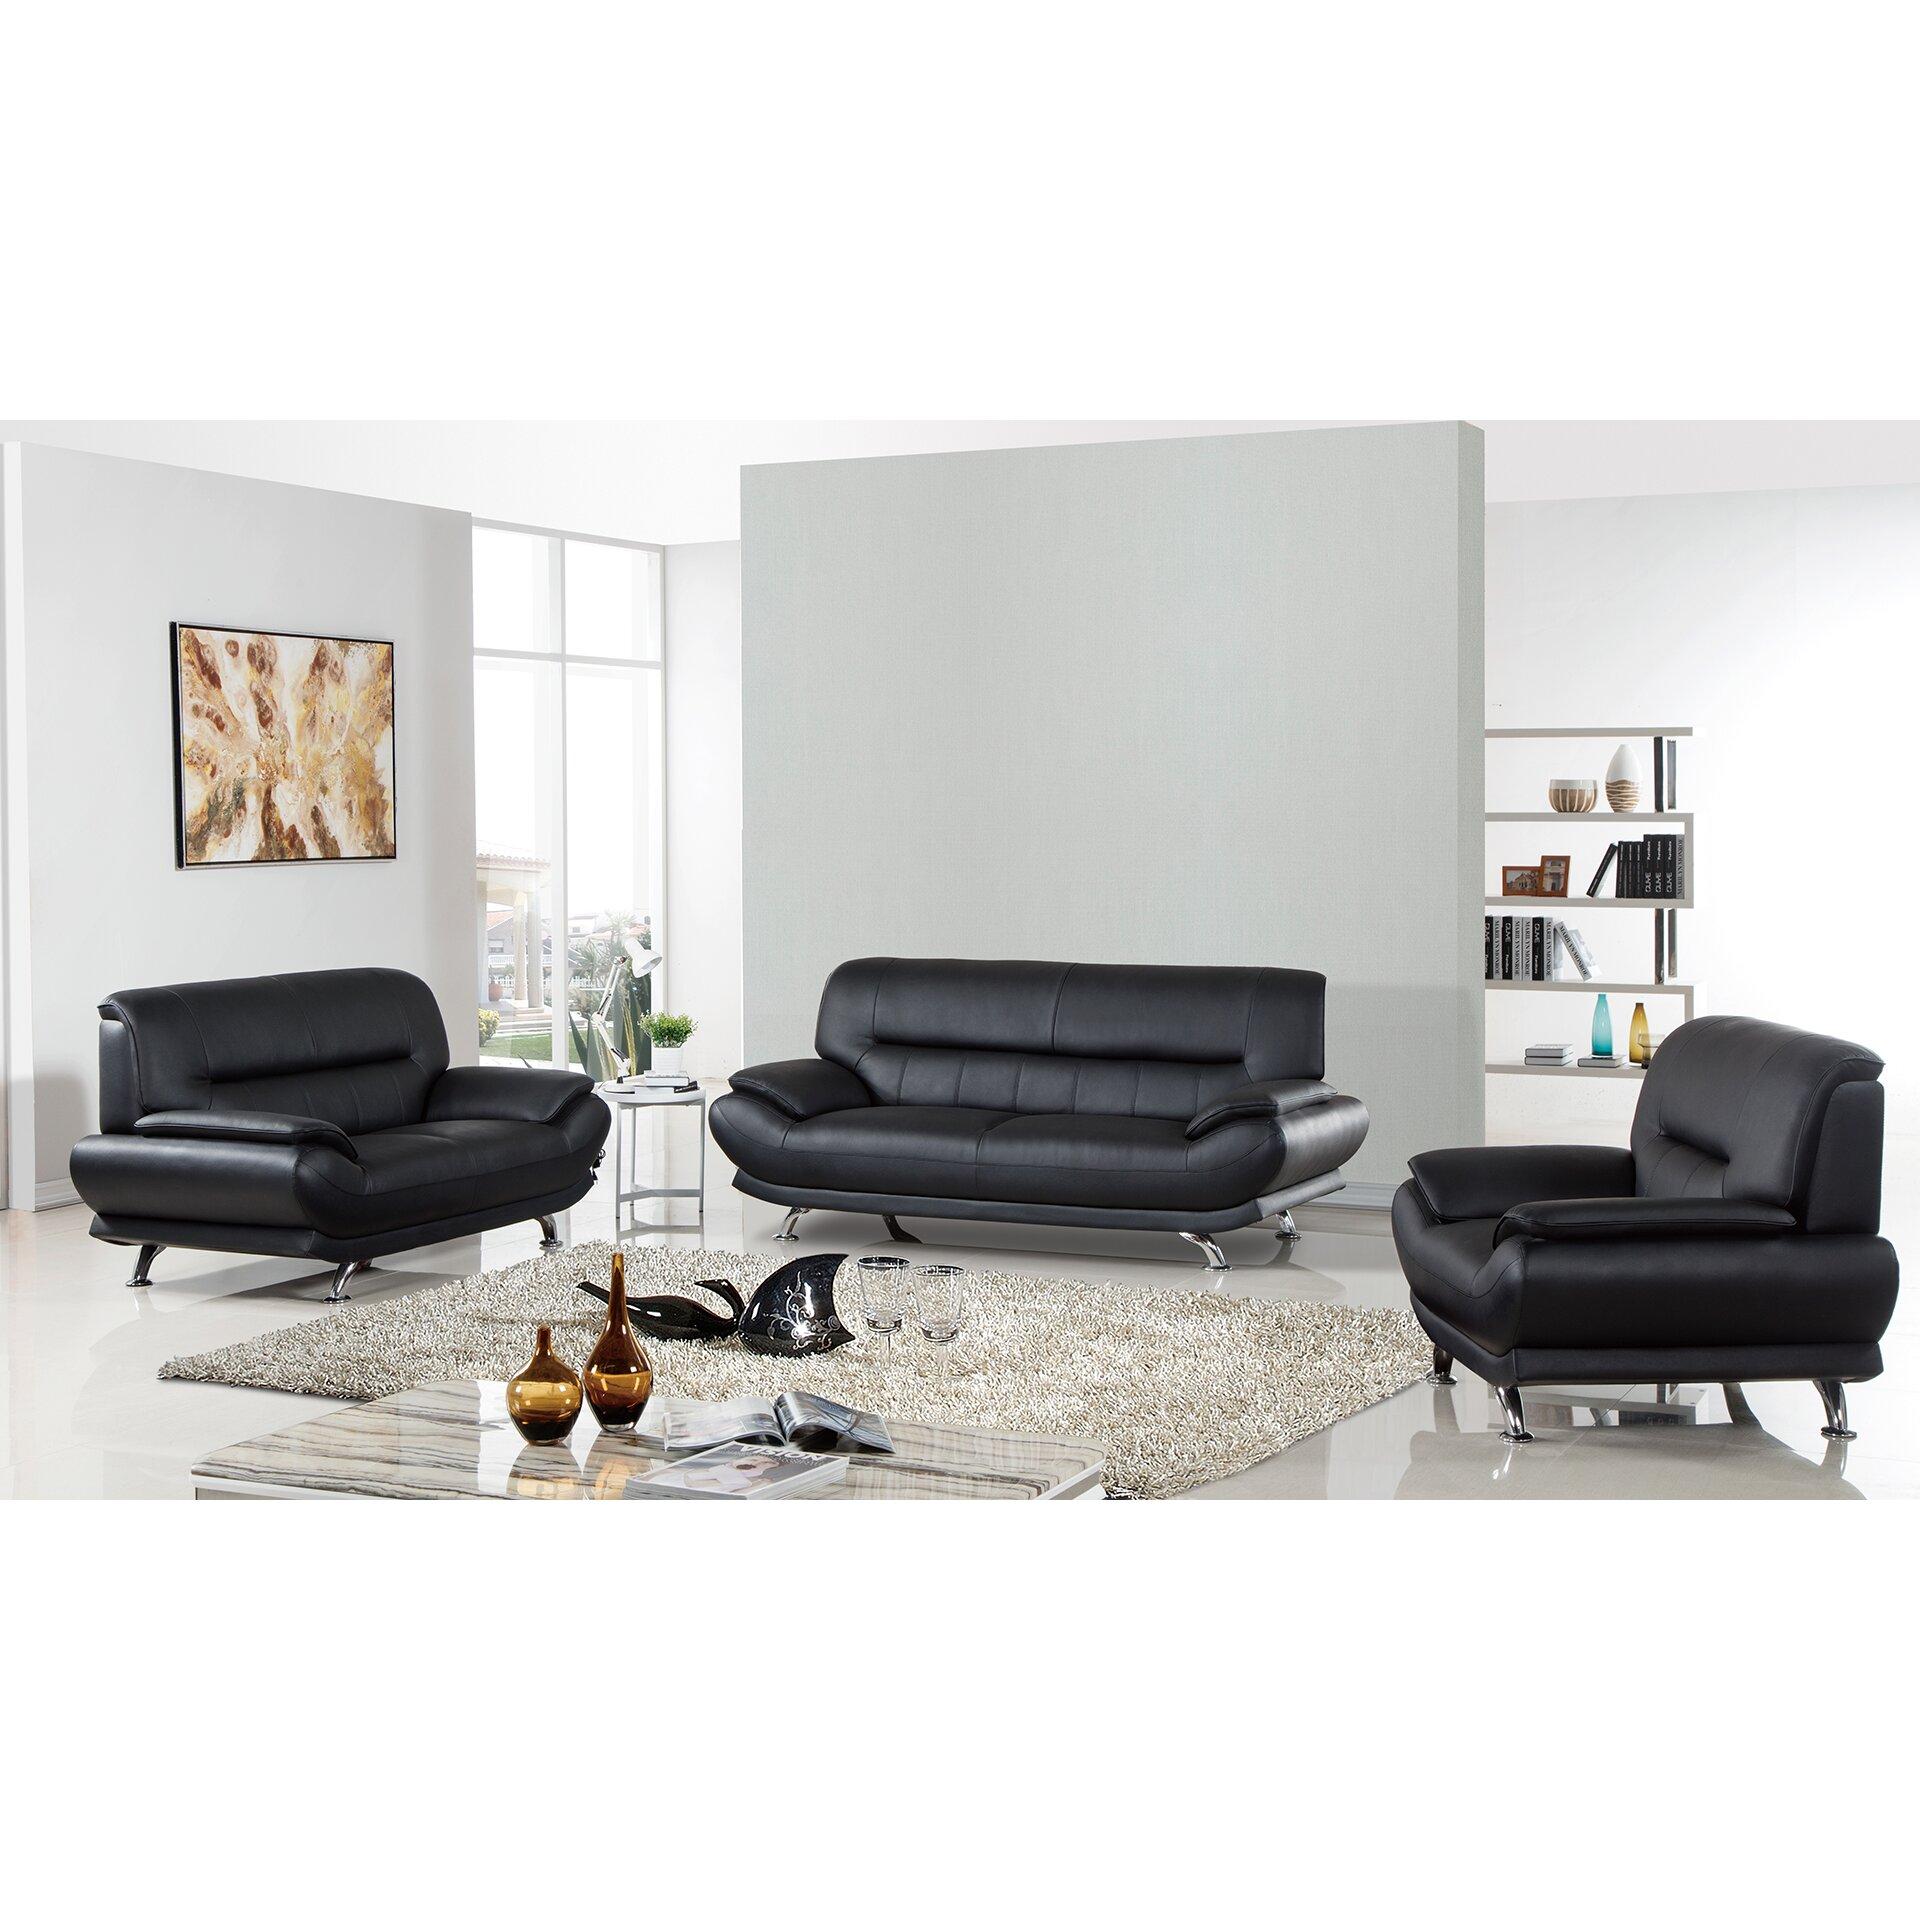 Americaneagleinternationaltrading Arcadia 3 Piece Leather Living Room Set Reviews Wayfair